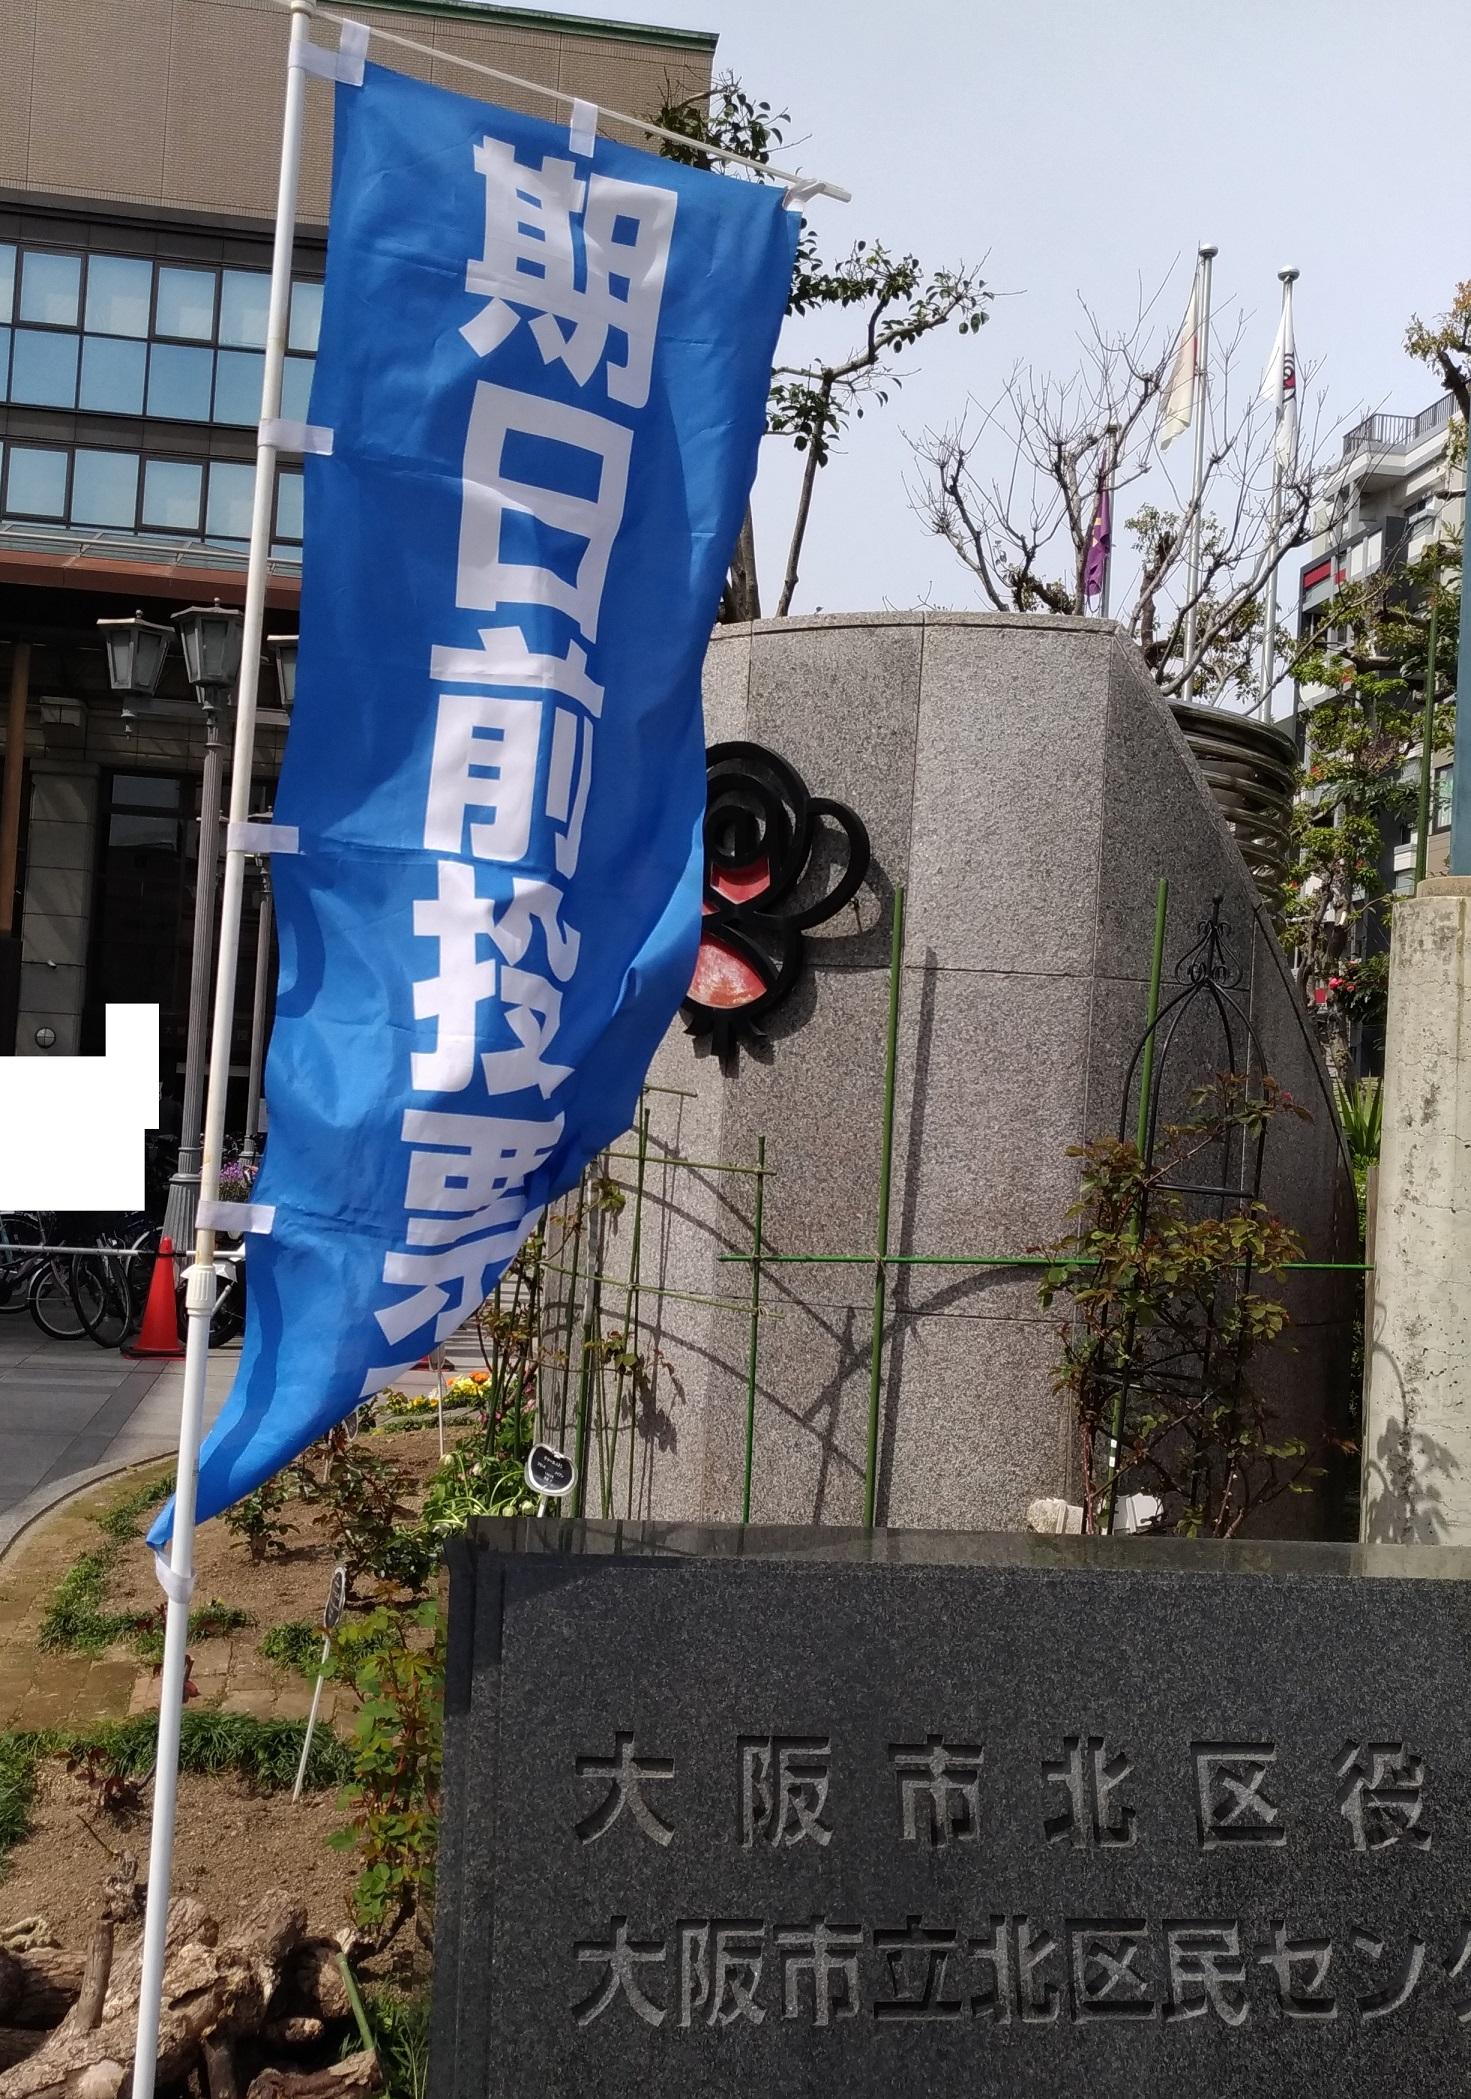 osaka_kijitumae_tohyo2019.jpg